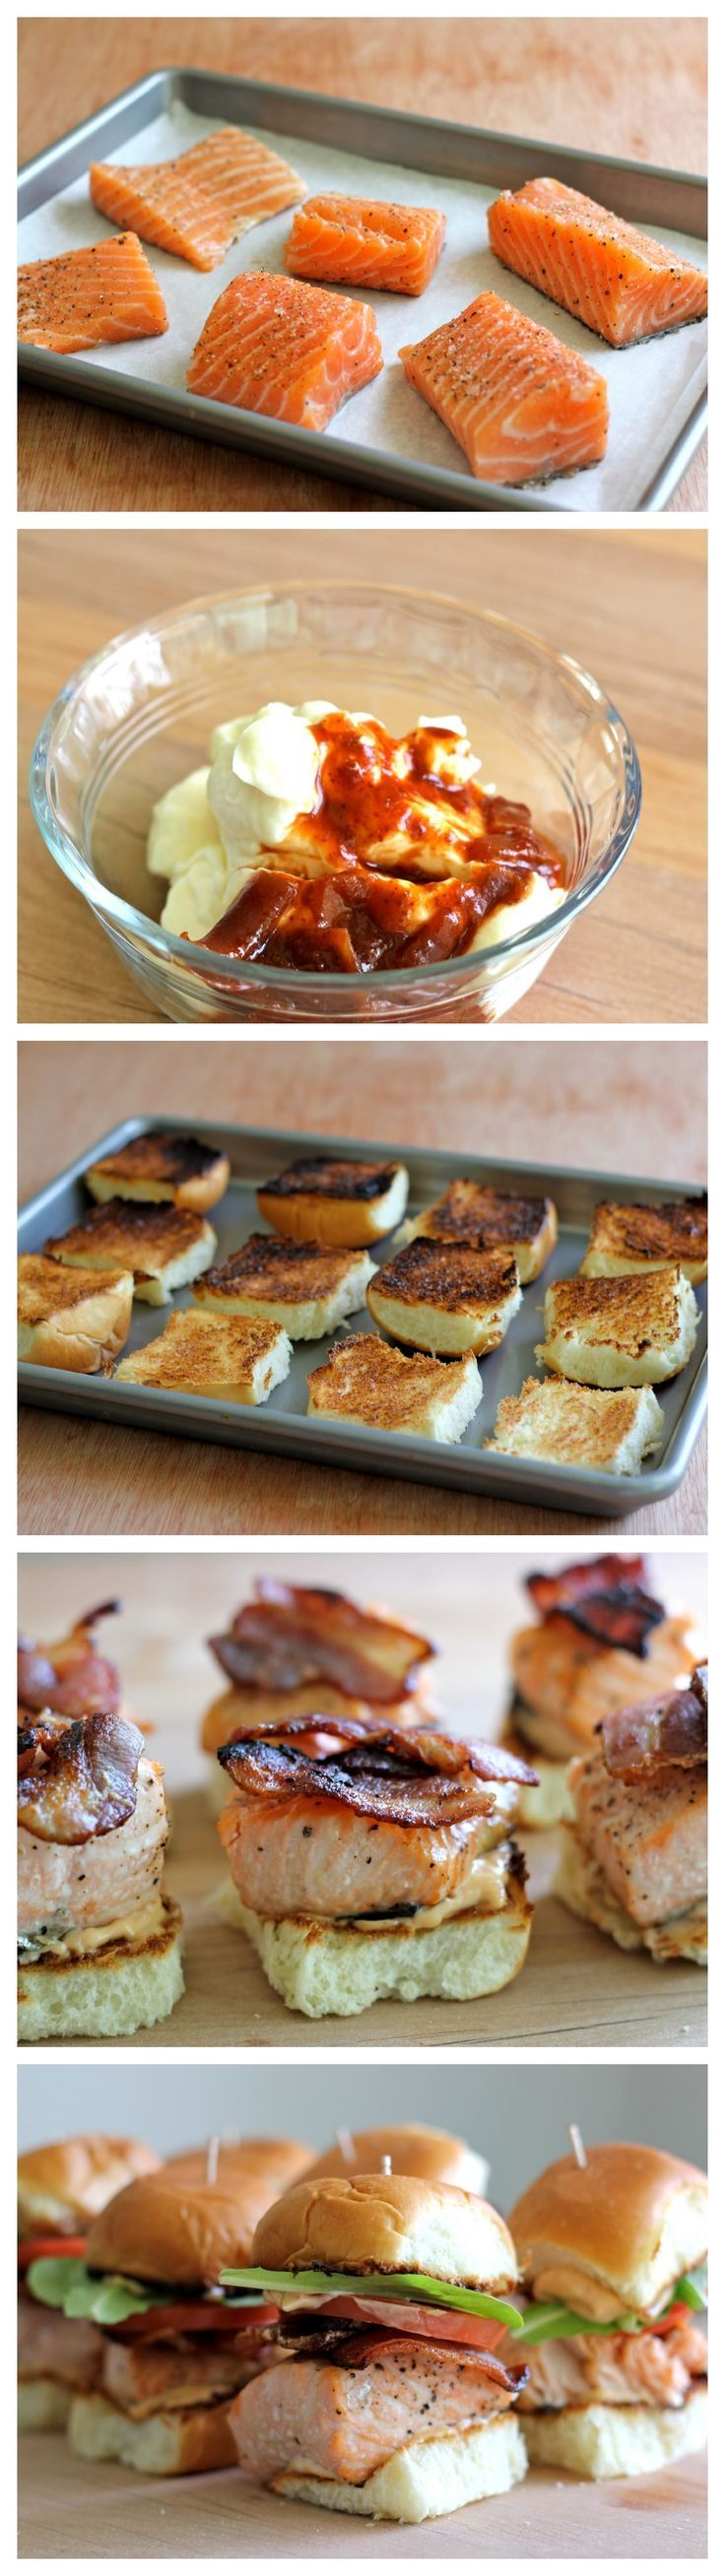 .Salmon BLT Sliders with Chipotle Mayo on Martin's Potato Rolls!